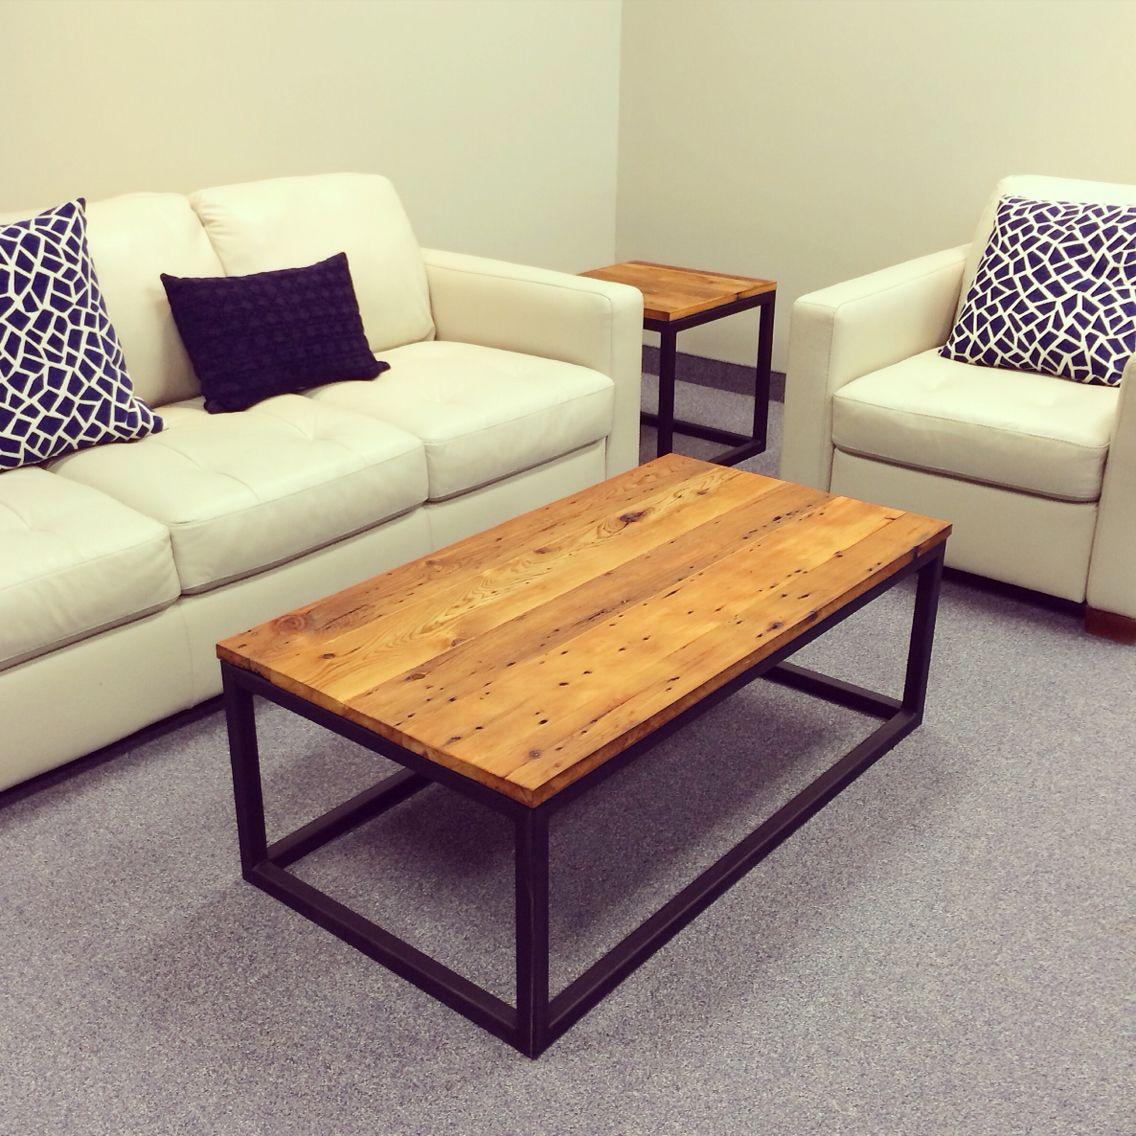 Reclaimed barn wood and steel coffee table